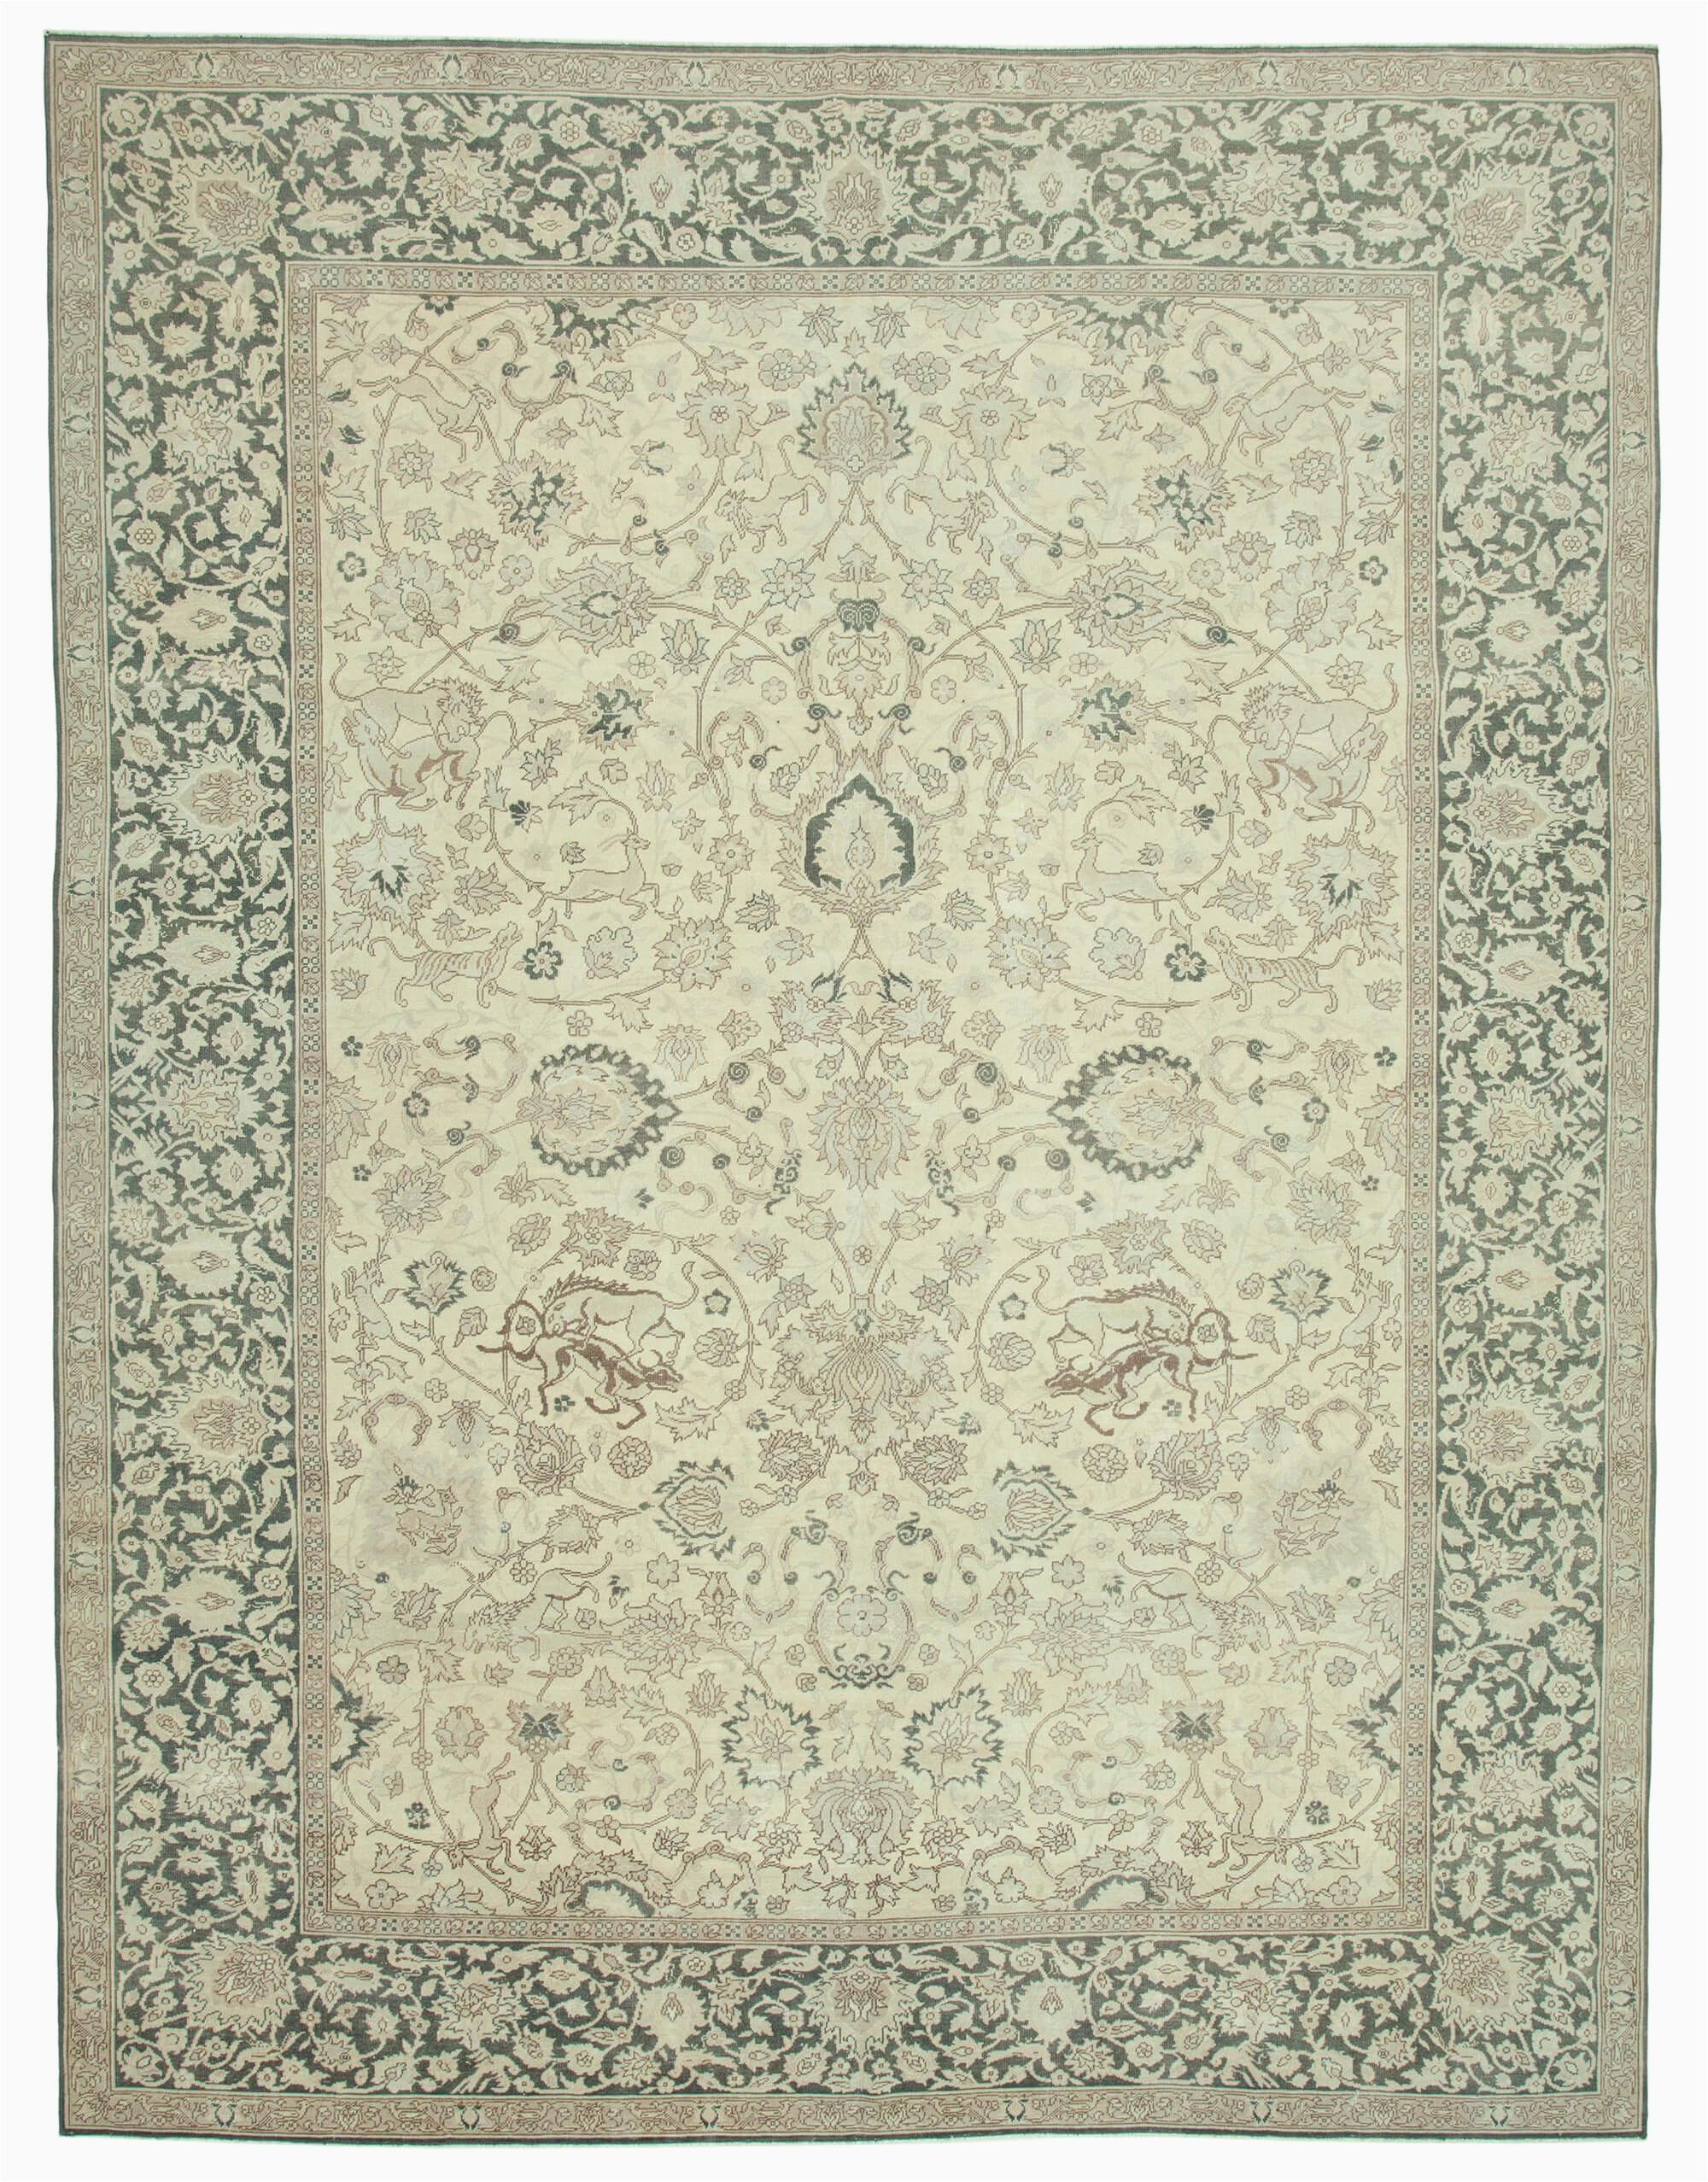 10x12 beige vintage large area rug